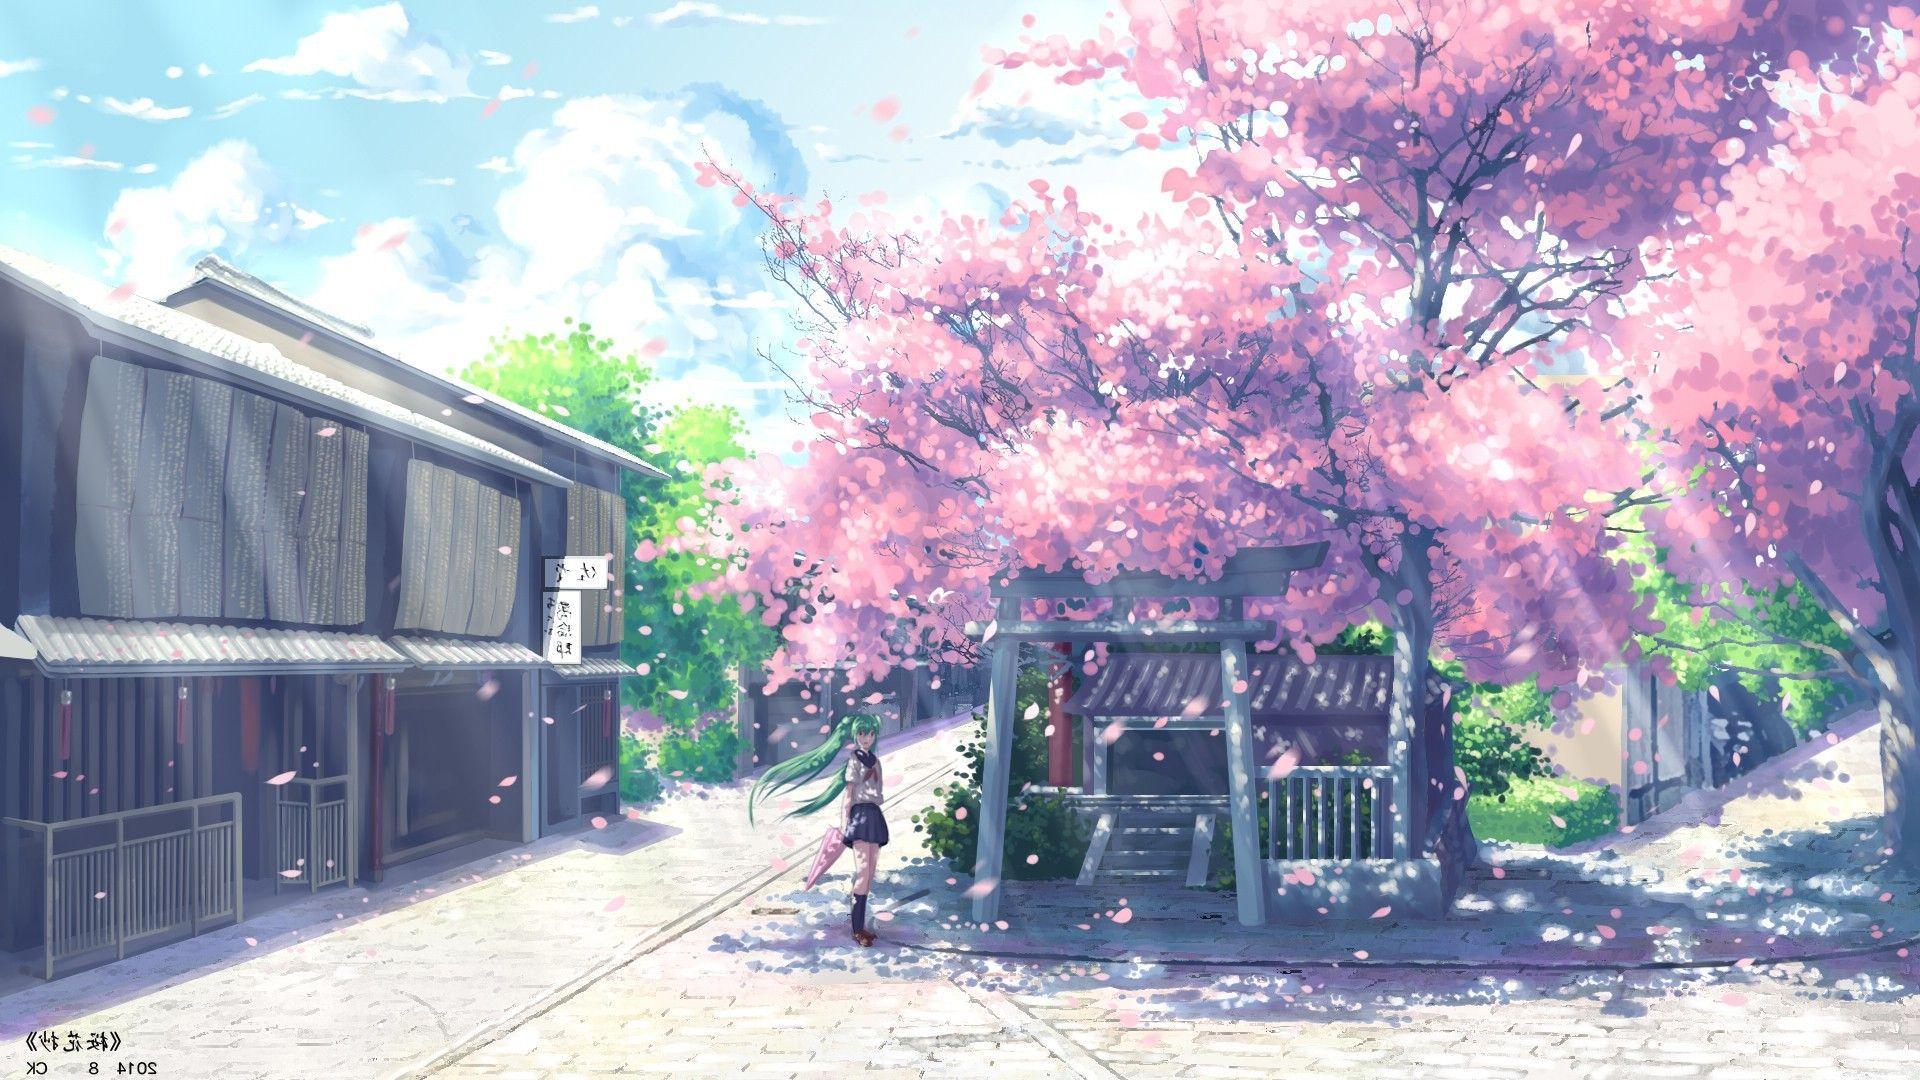 4k Aesthetic Anime Wallpapers - Wallpaper Cave